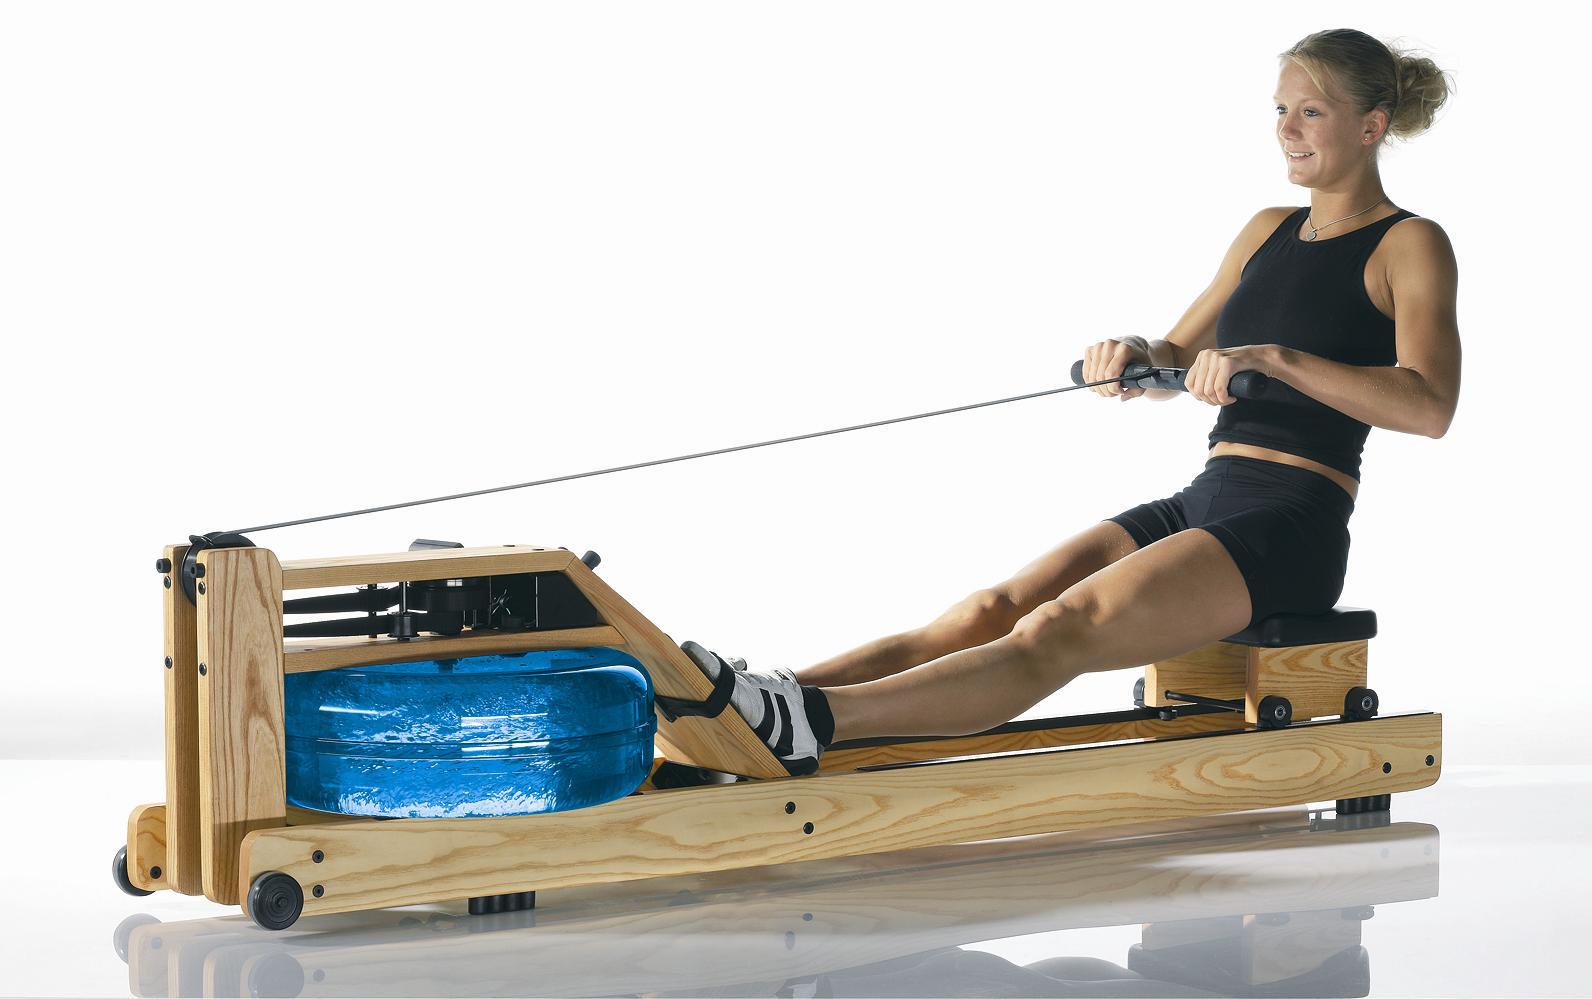 Https Www Waterrower Com Us Shop Natural Rowing Machine Html